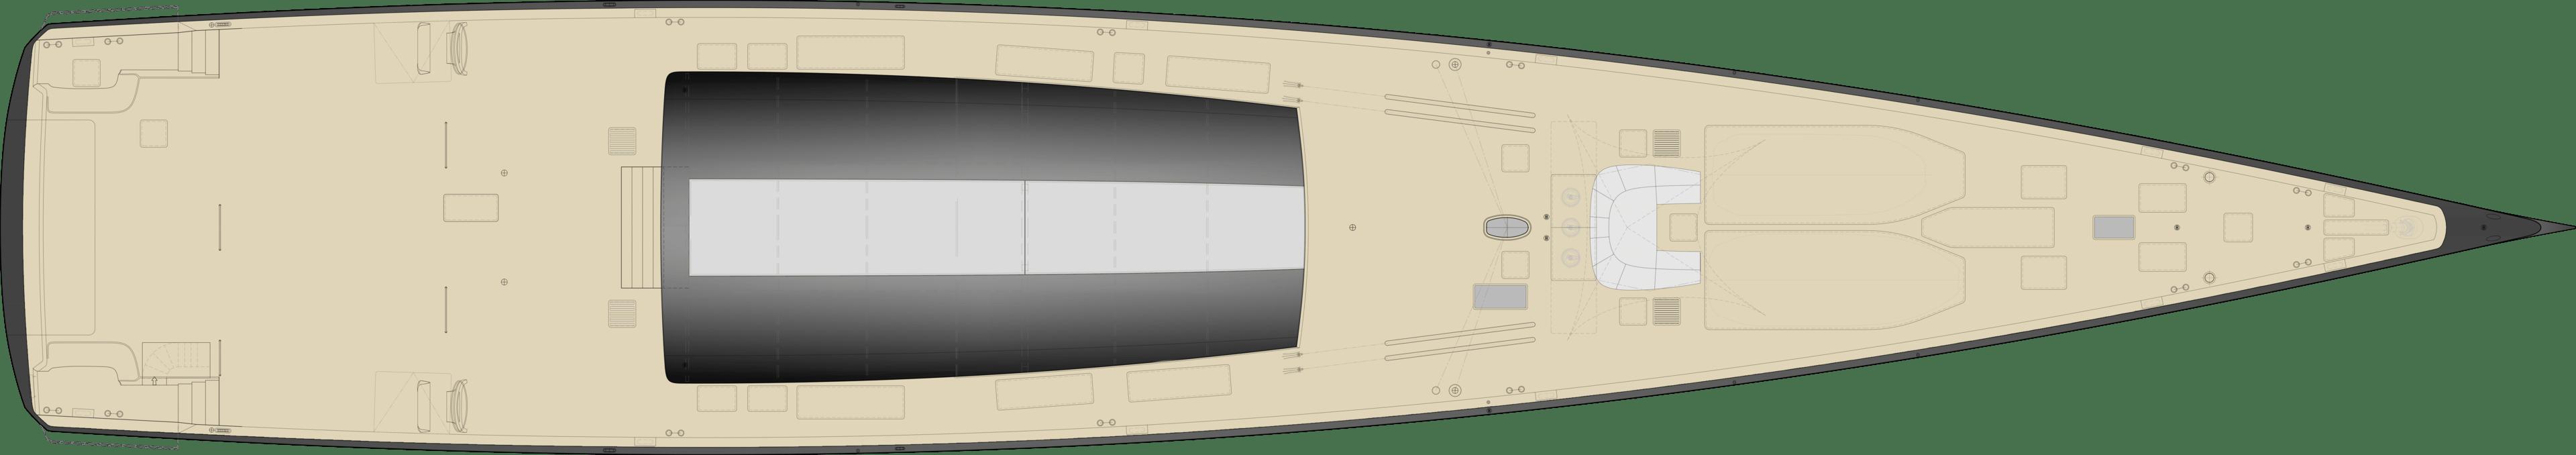 MMYD_043_85m_Publicity_Main Deck Plan.png